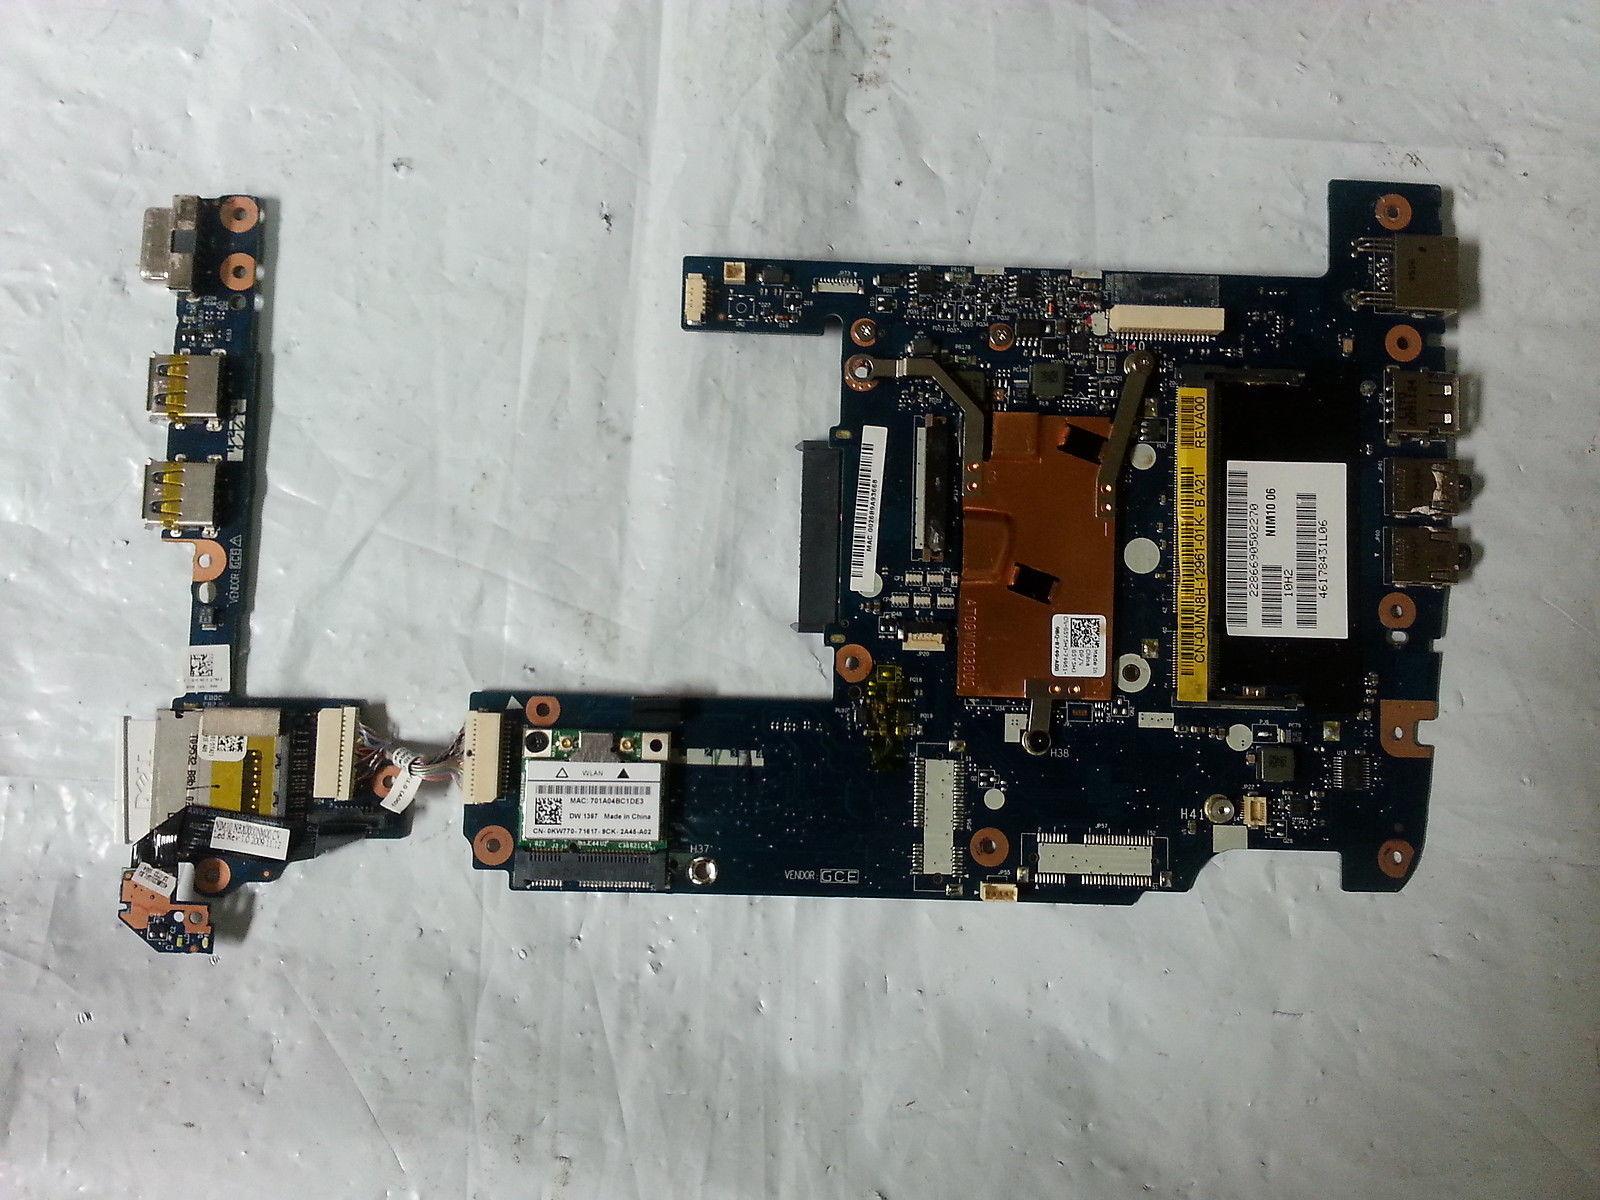 Oem Dell Inspiron 1012 P04T Mini Laptop and 50 similar items